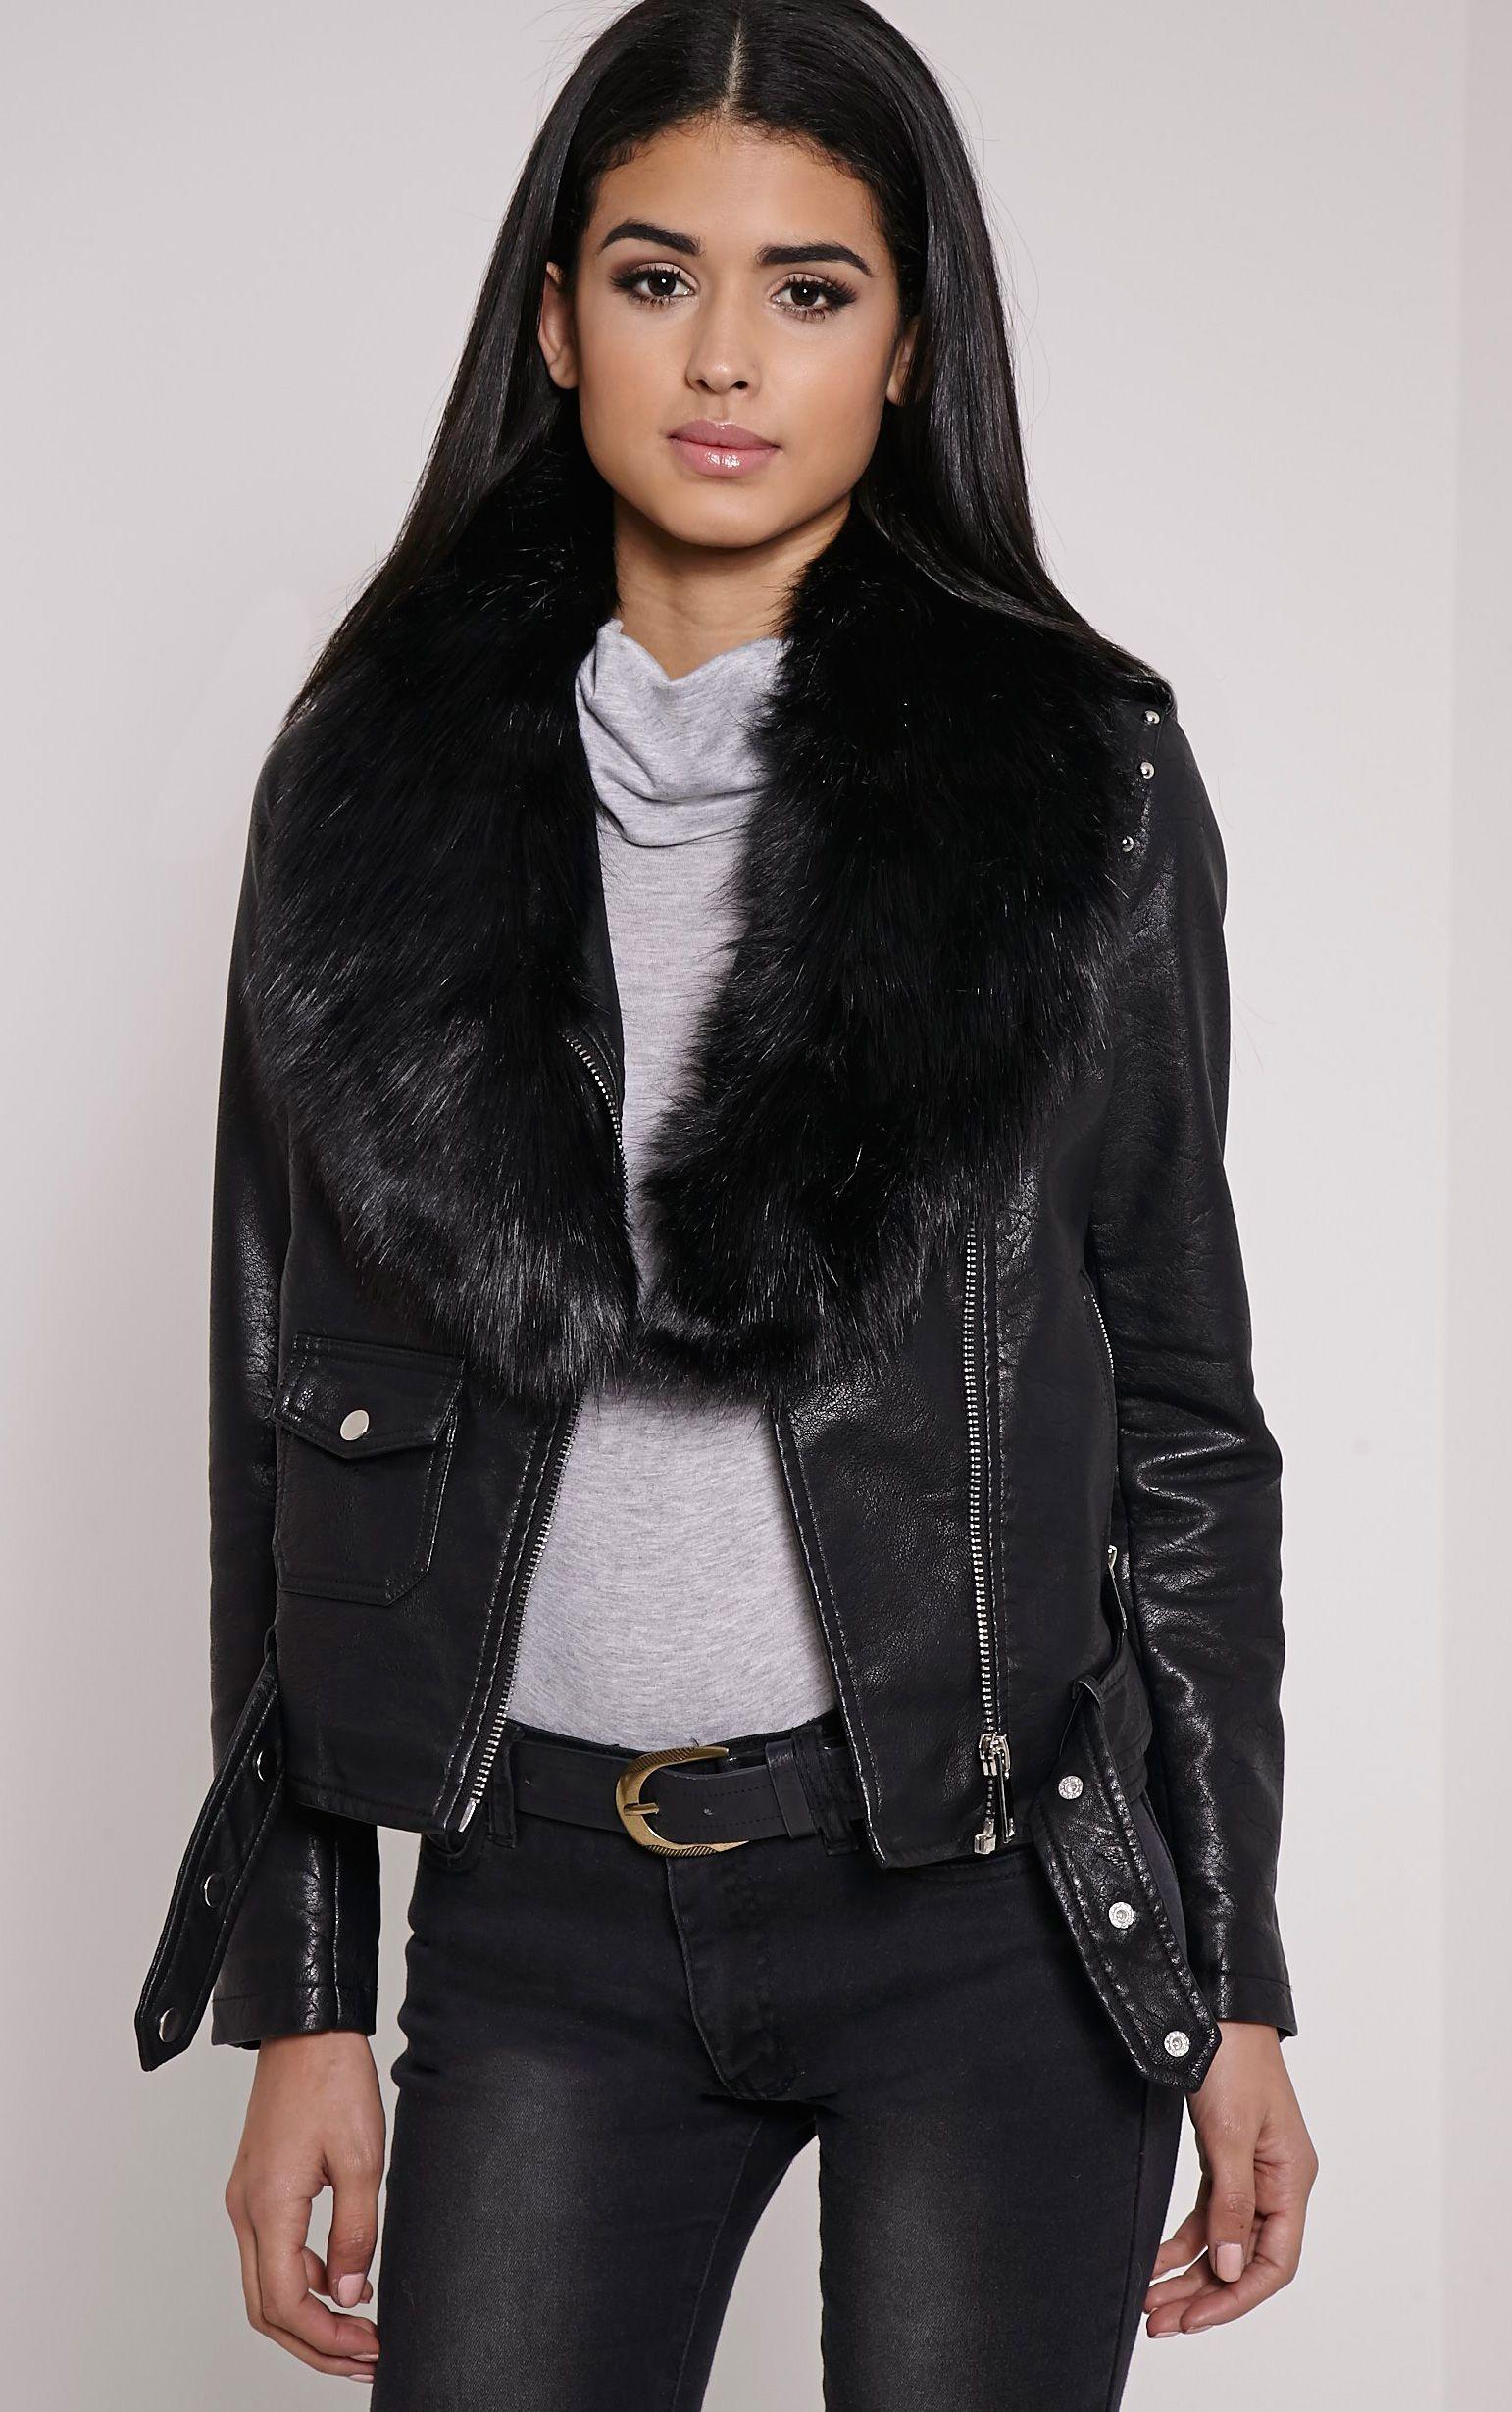 Kira Black Faux Fur Collar Black